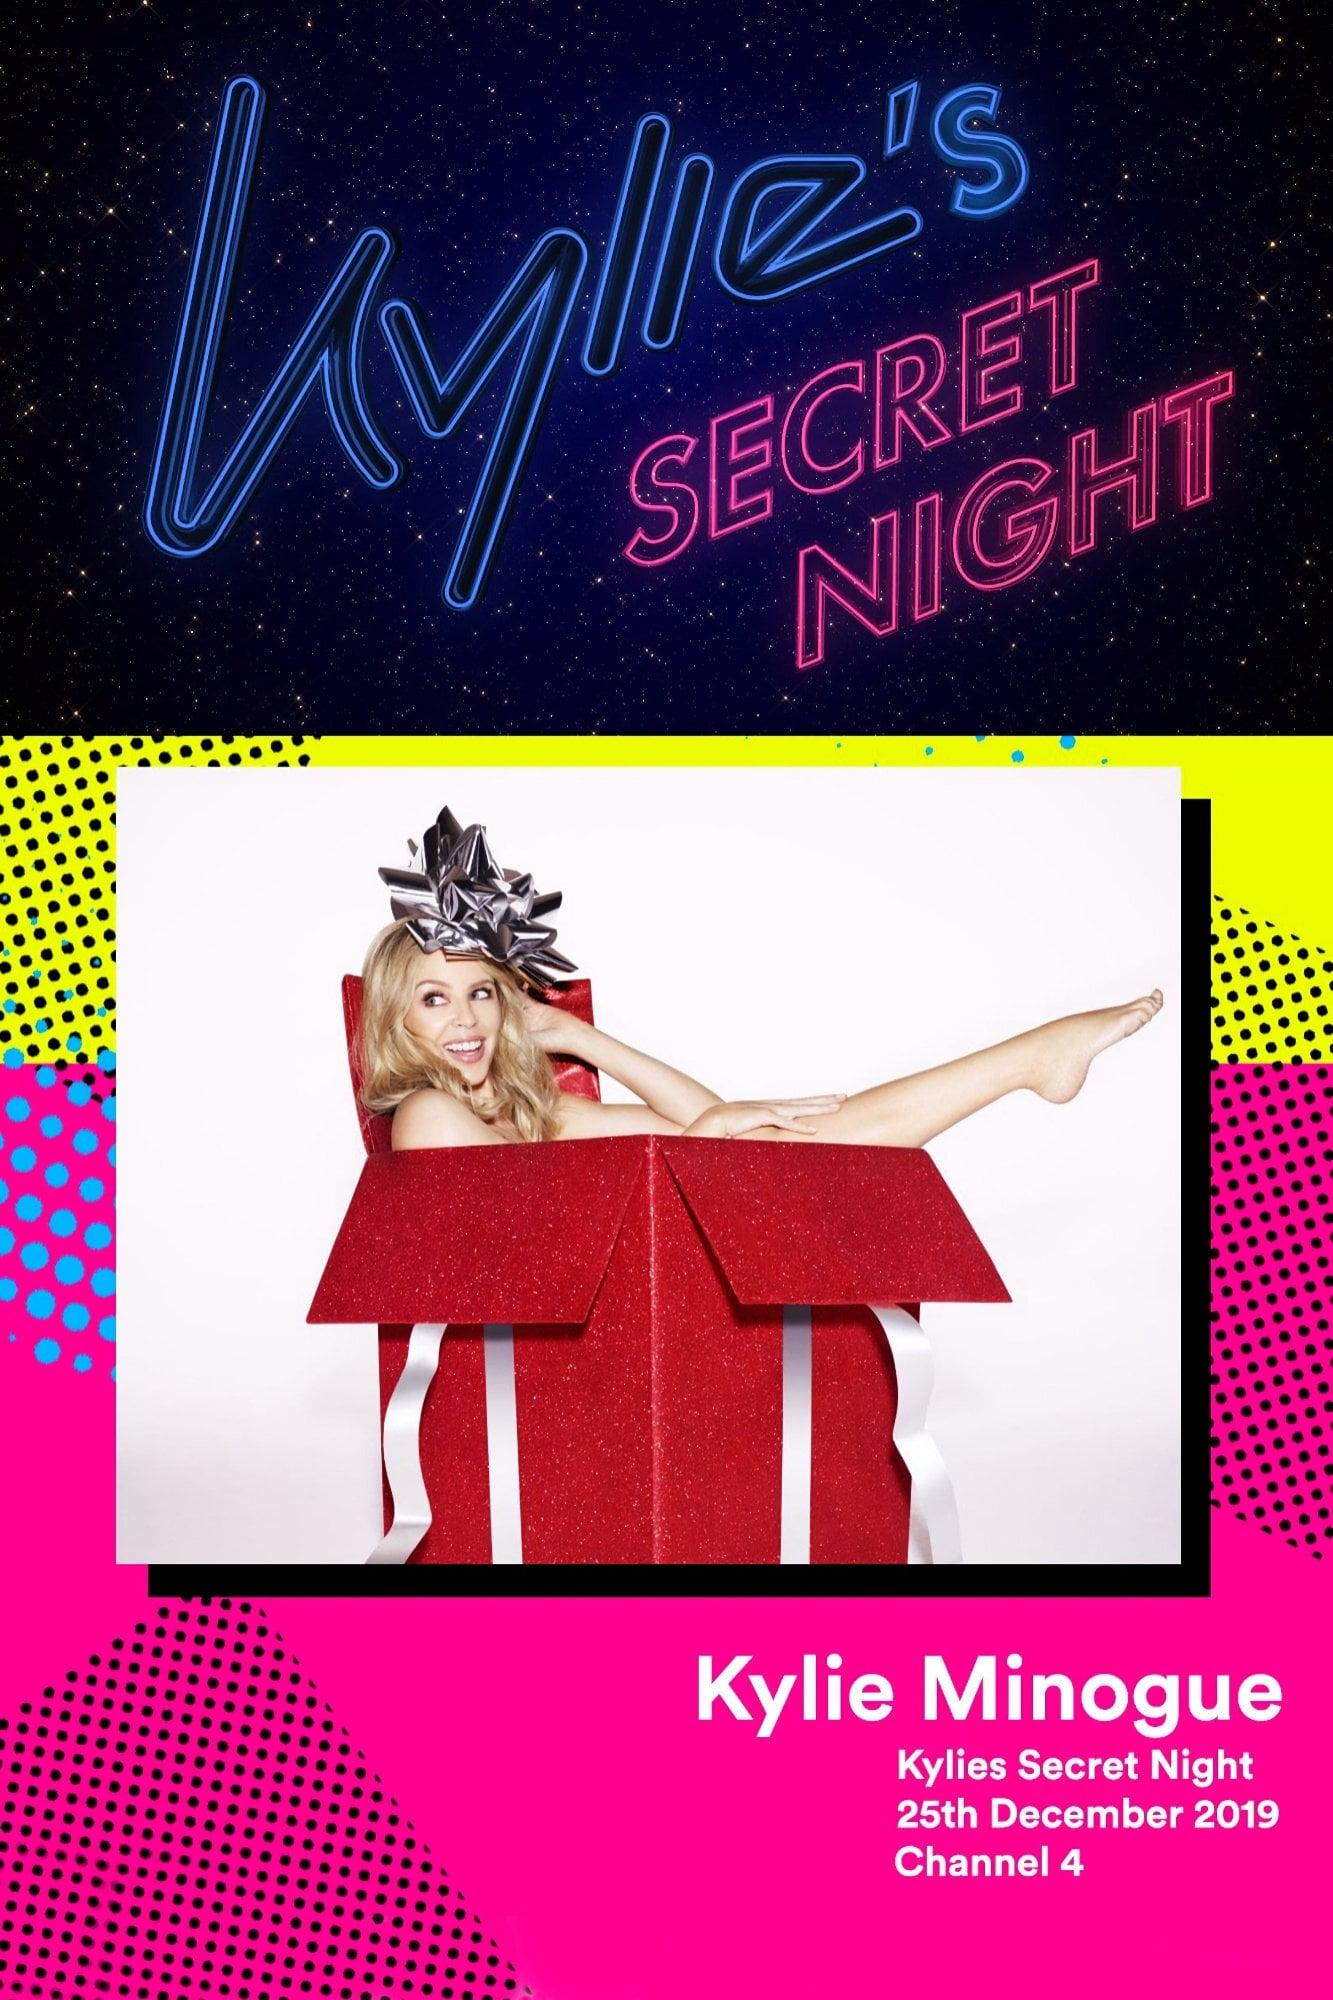 Kylie Minogue: Kylie's Secret Night